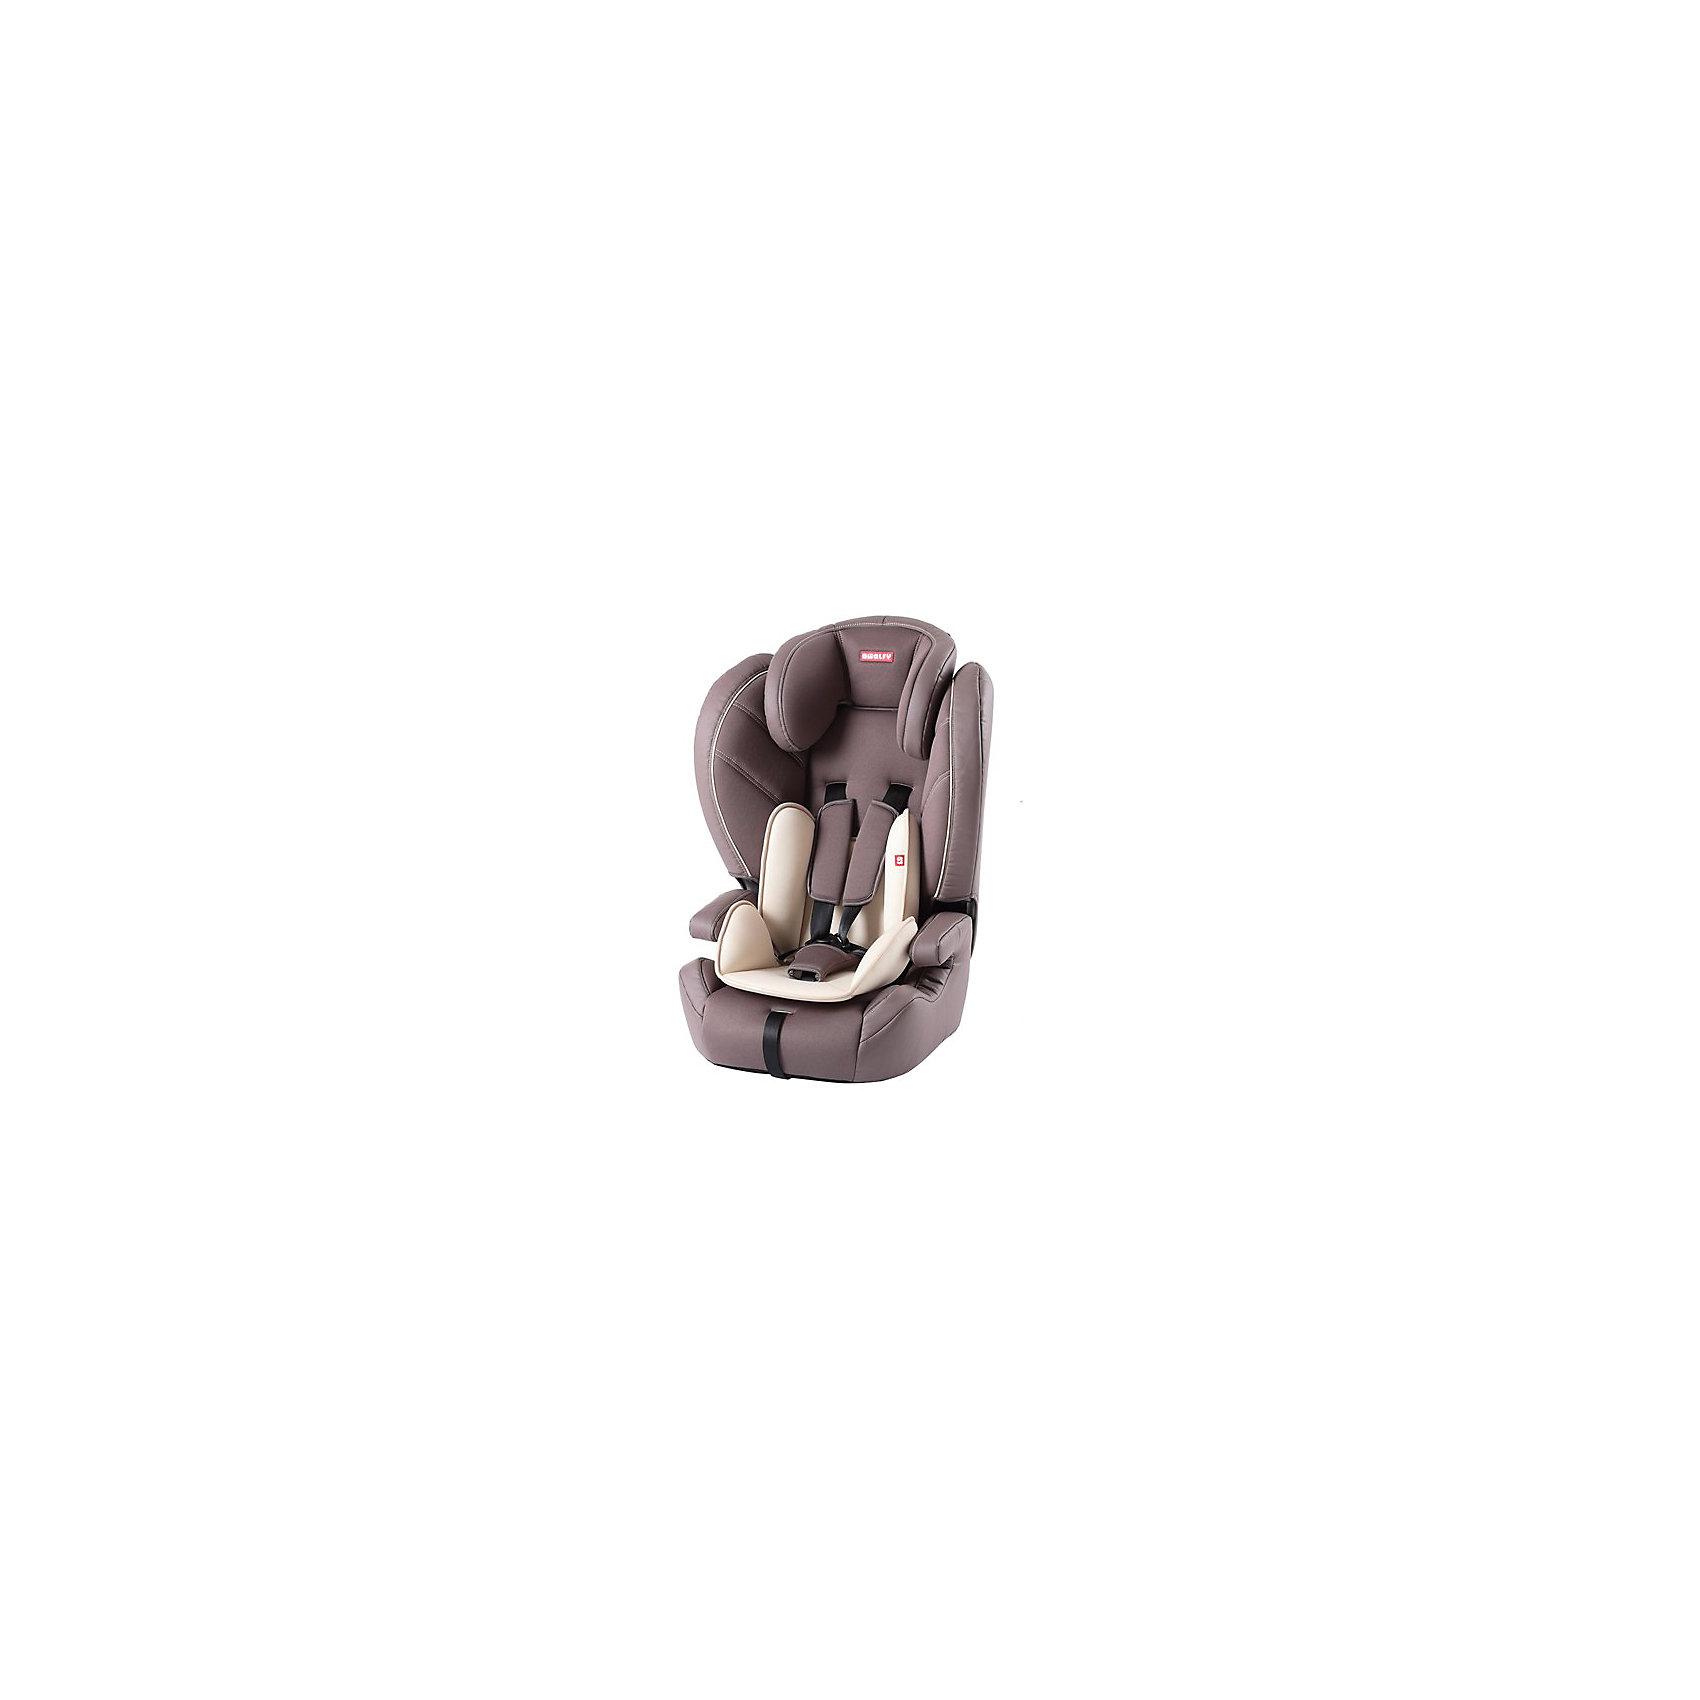 - Автокресло НB-508, 9-36 кг, Amalfy, бордо amalfy нb 508 black